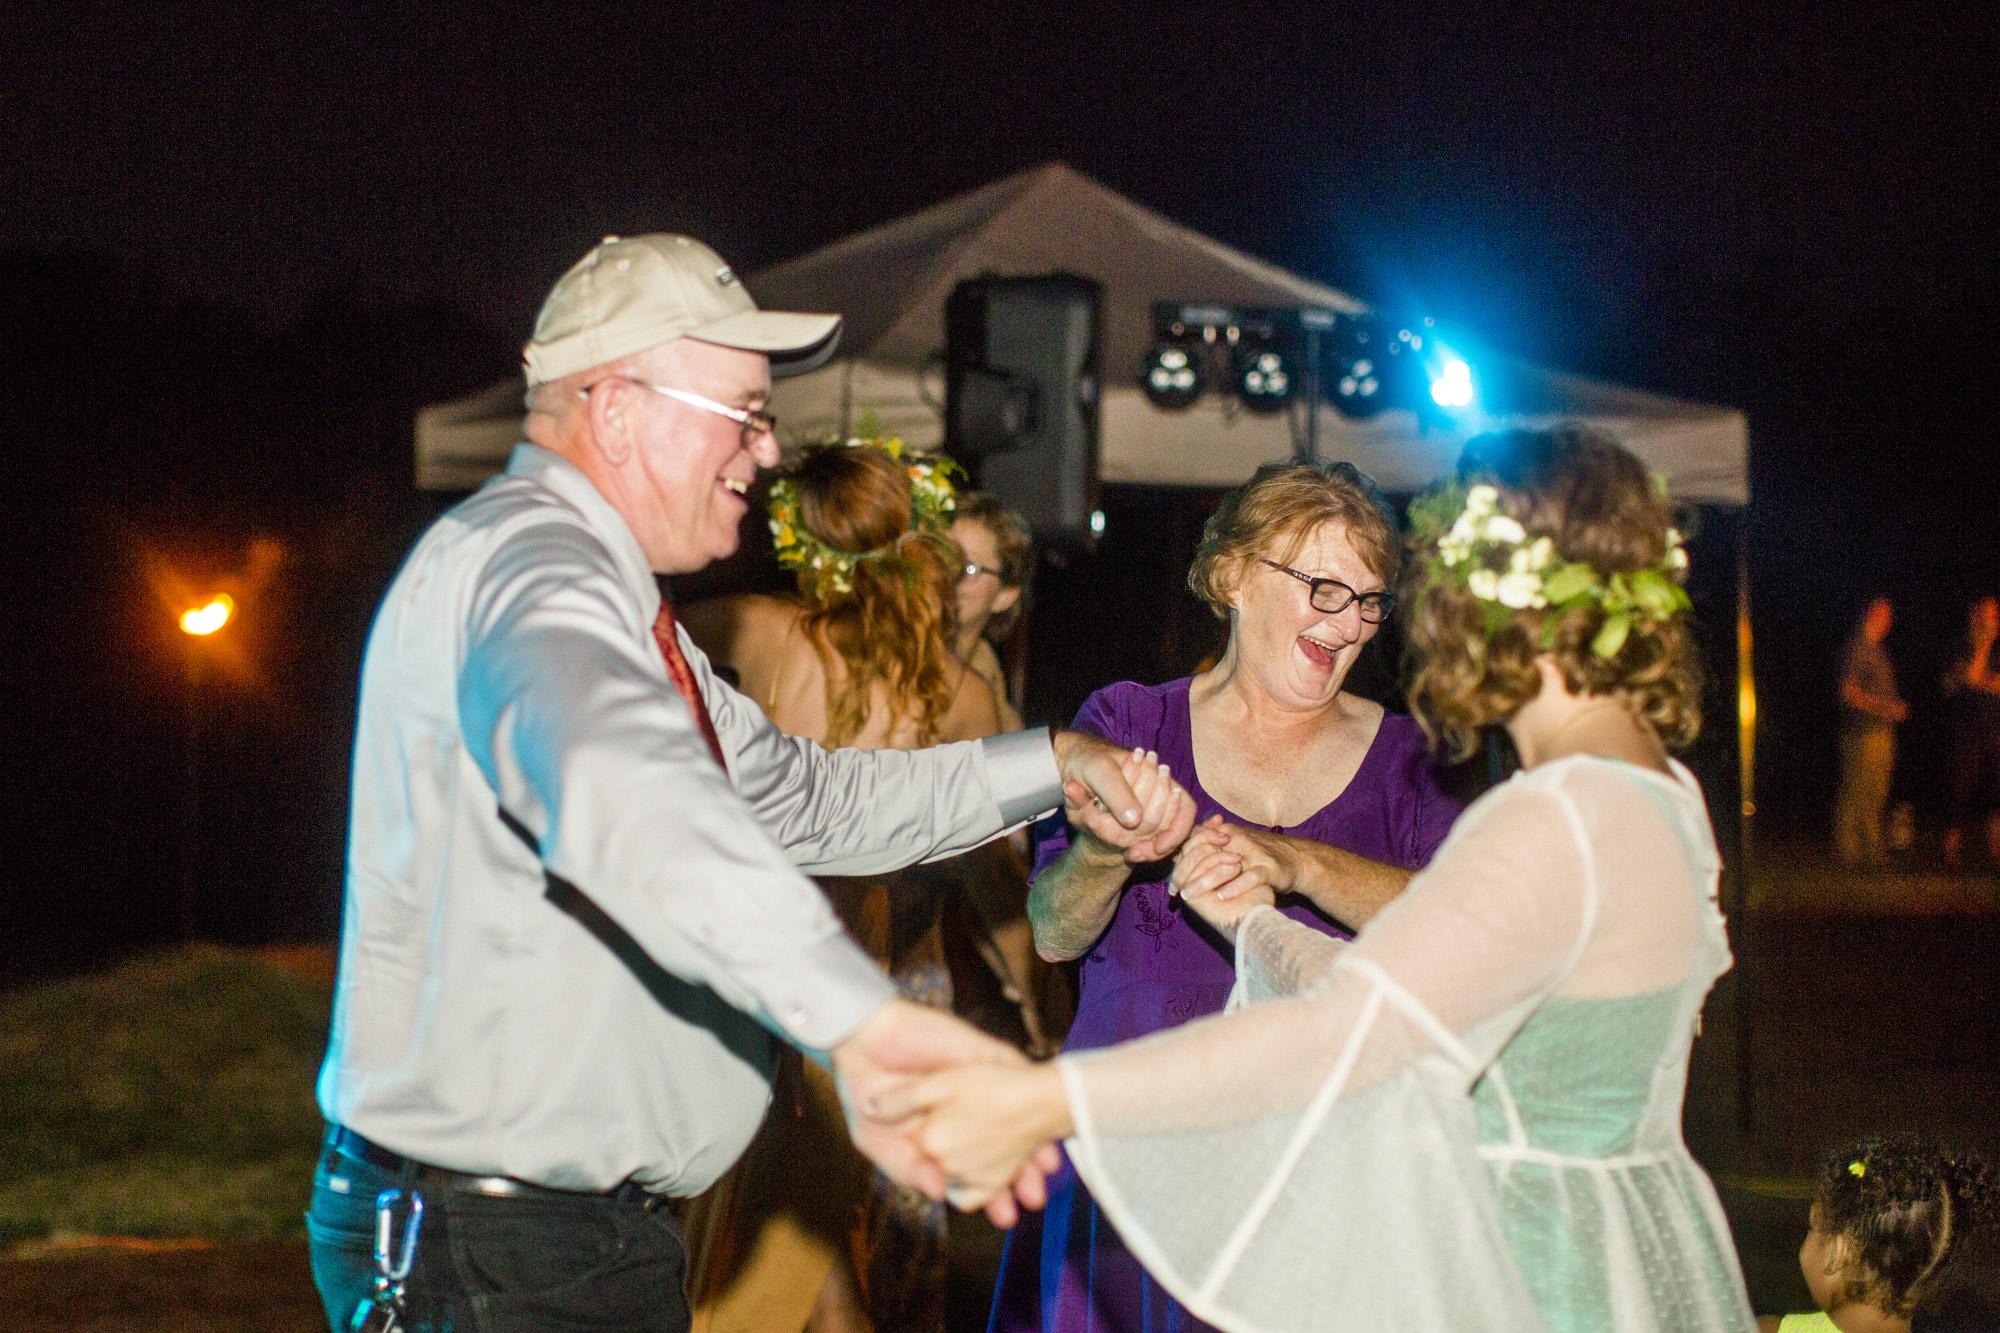 Seriously_Sabrina_Photography_Red_River_Gorge_Kentucky_Wedding_ShawnDana210.jpg